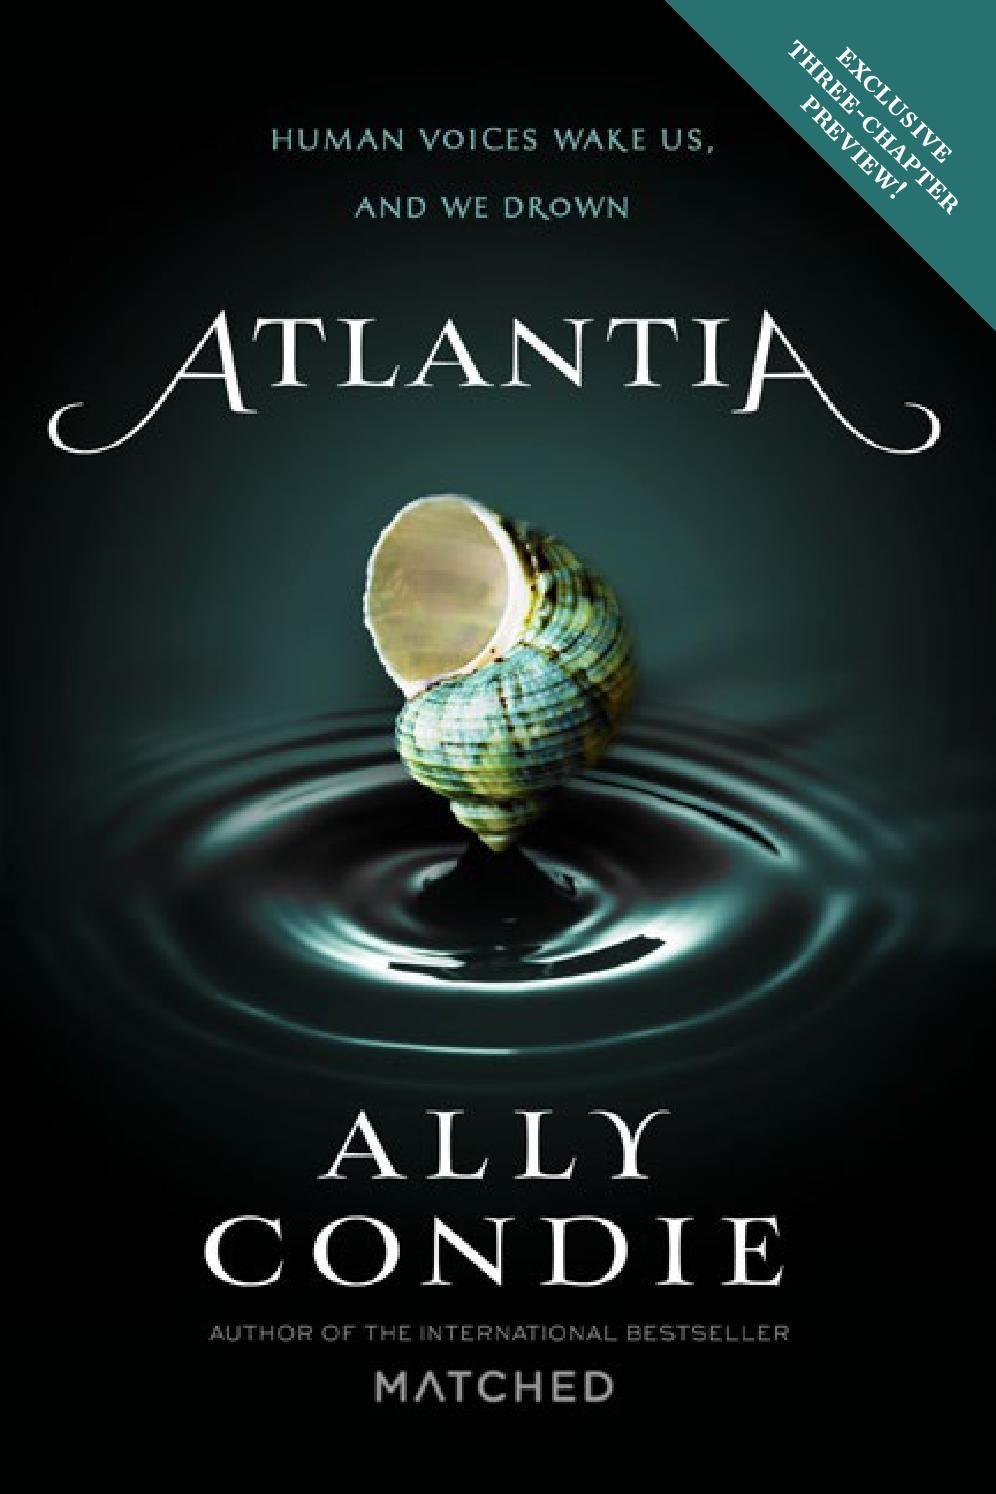 Atlantia by Ally Condie (Excerpt) http://issuu.com/penguinteen/docs/9780525426448_original_atlantia/1